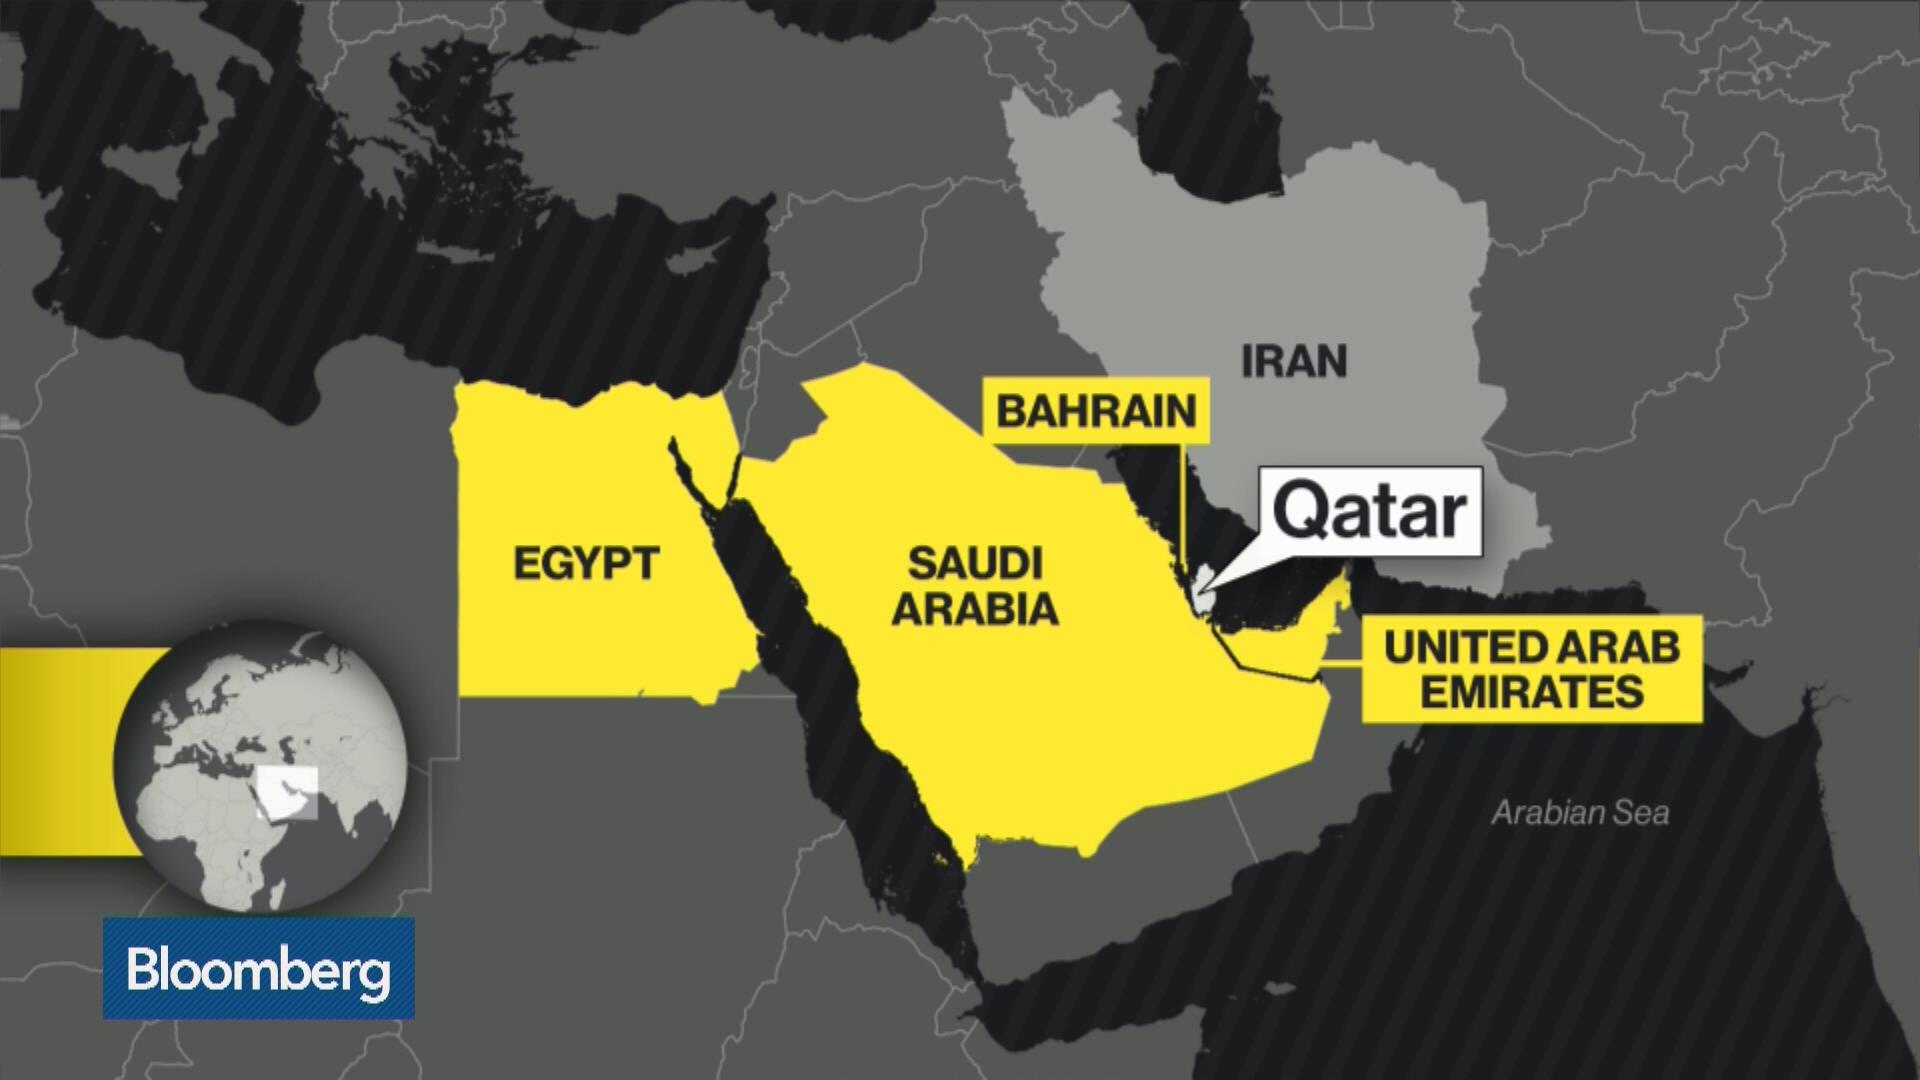 UAE Closes Airspace To Qatar Flights As Gulf Spat Deepens